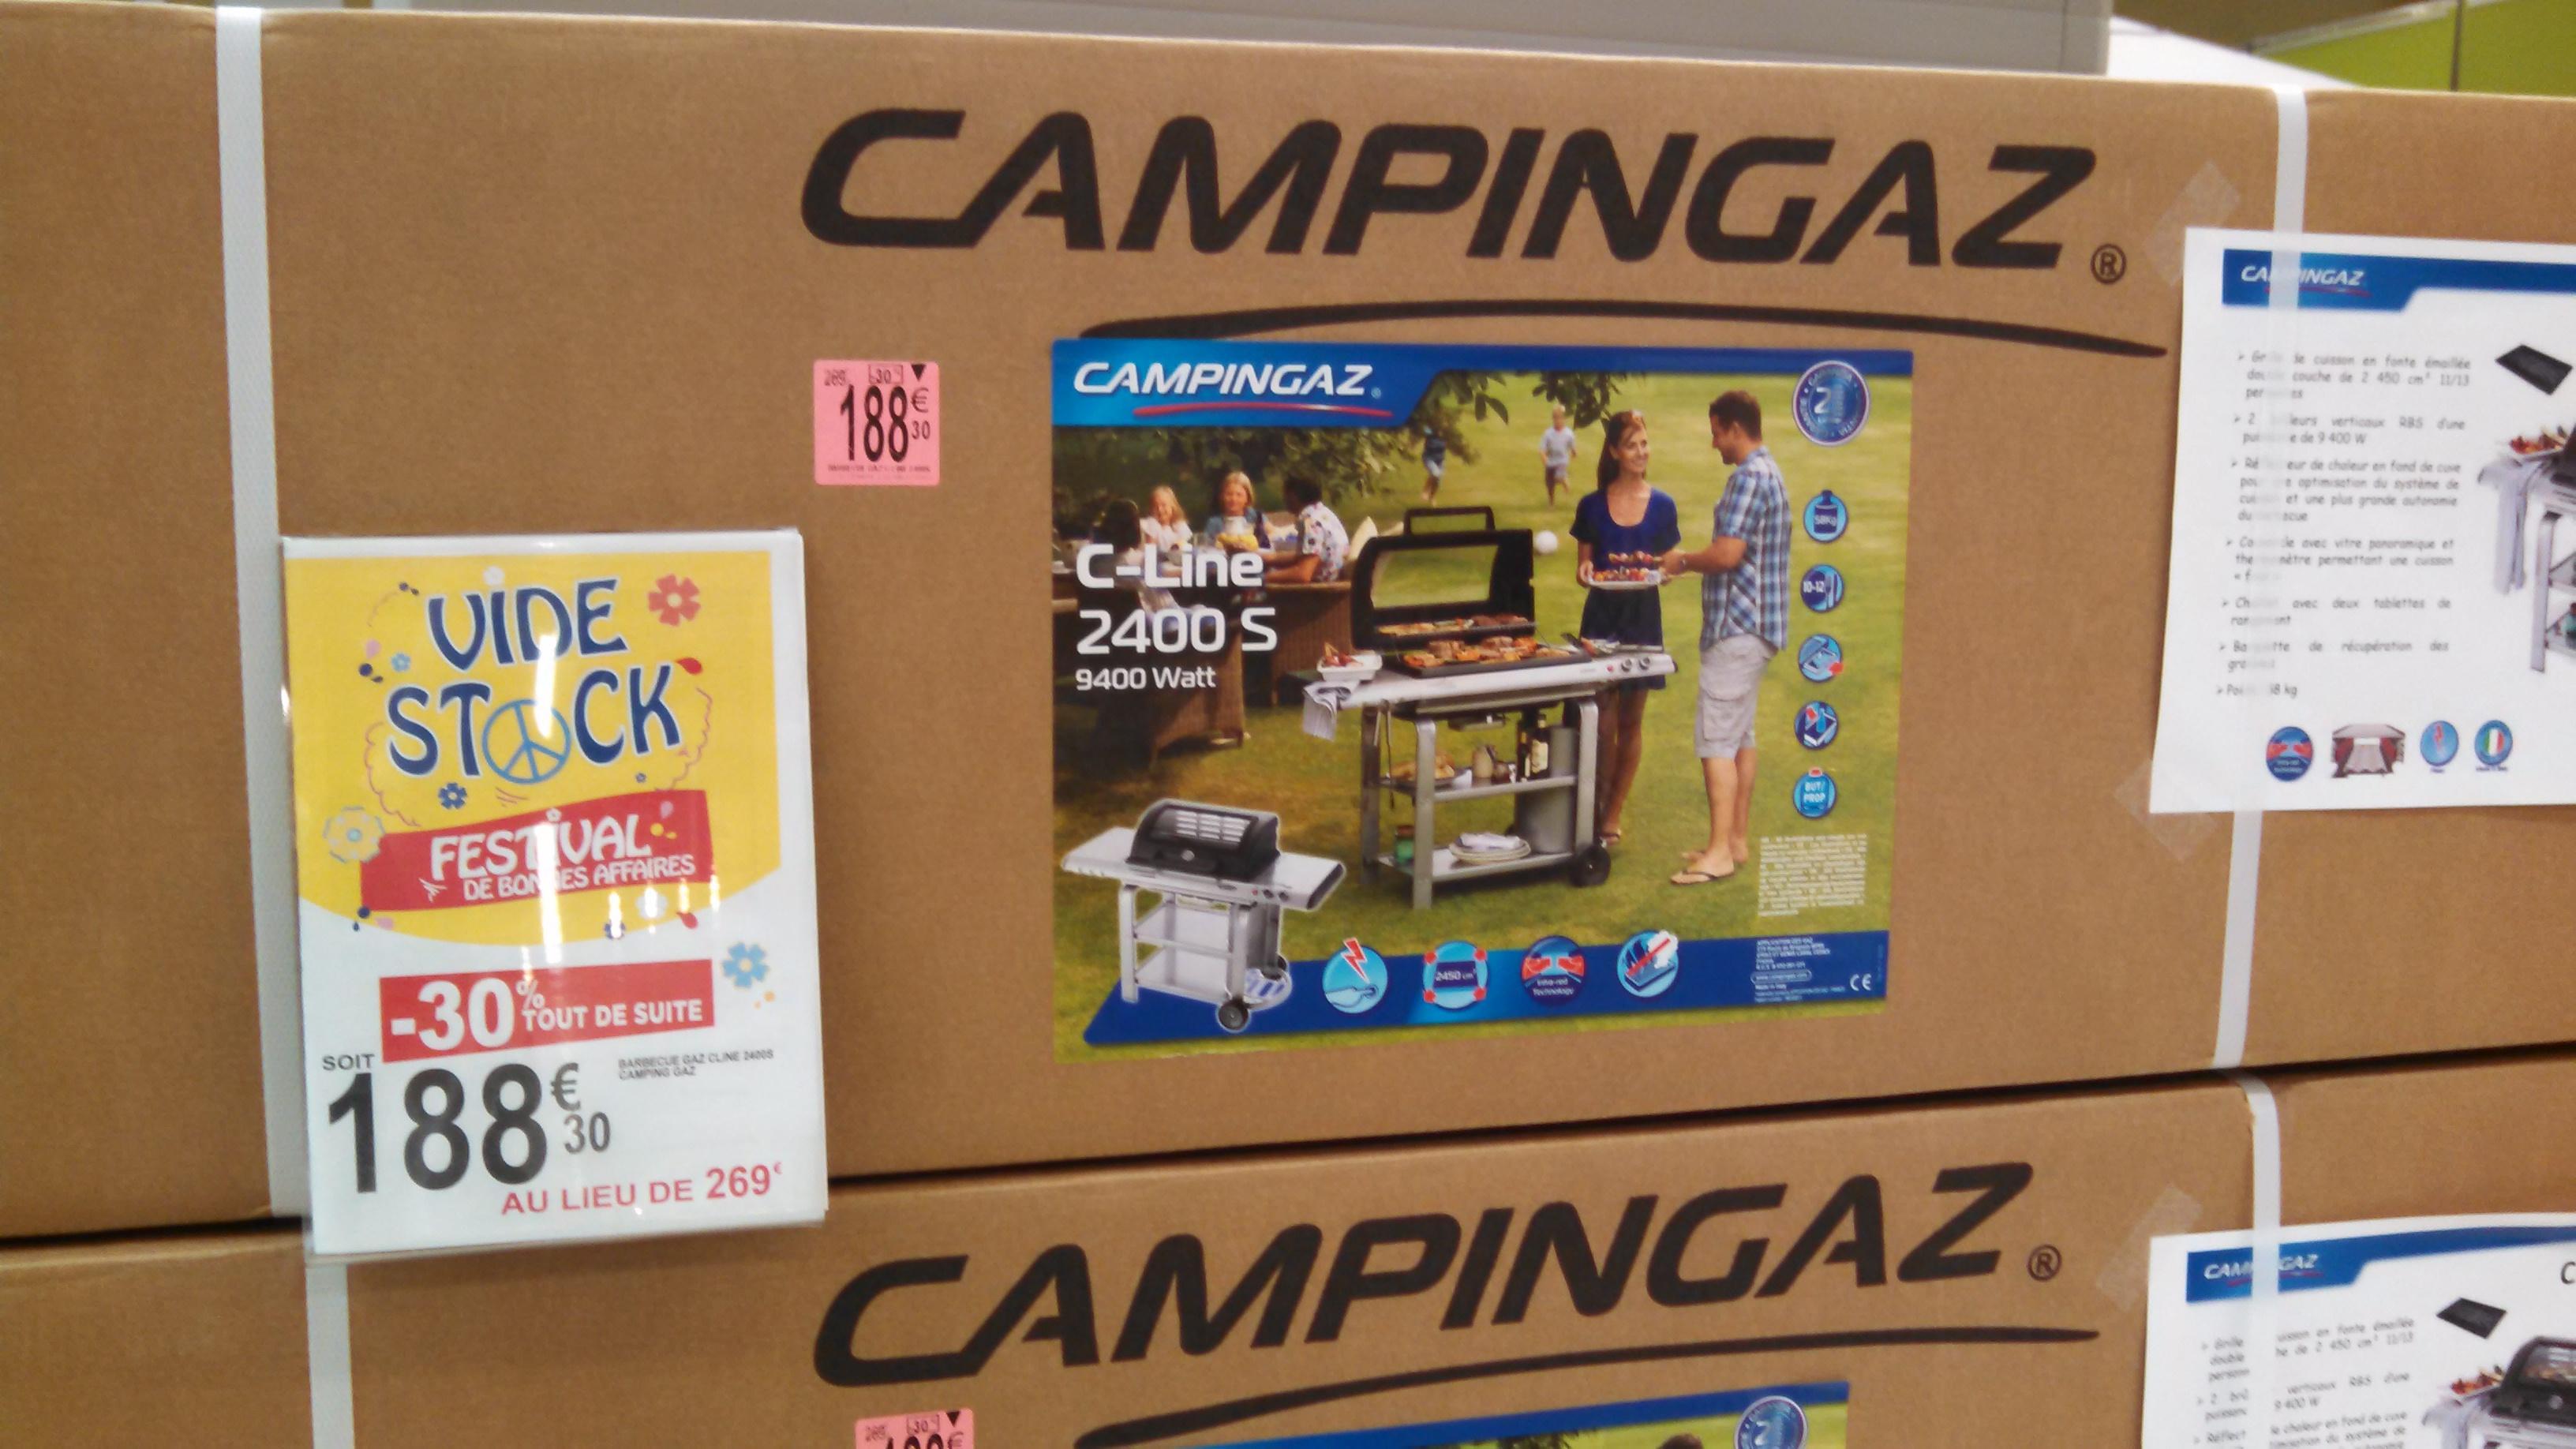 Barbecue à gaz -  Camping Gaz C-Line 2400S